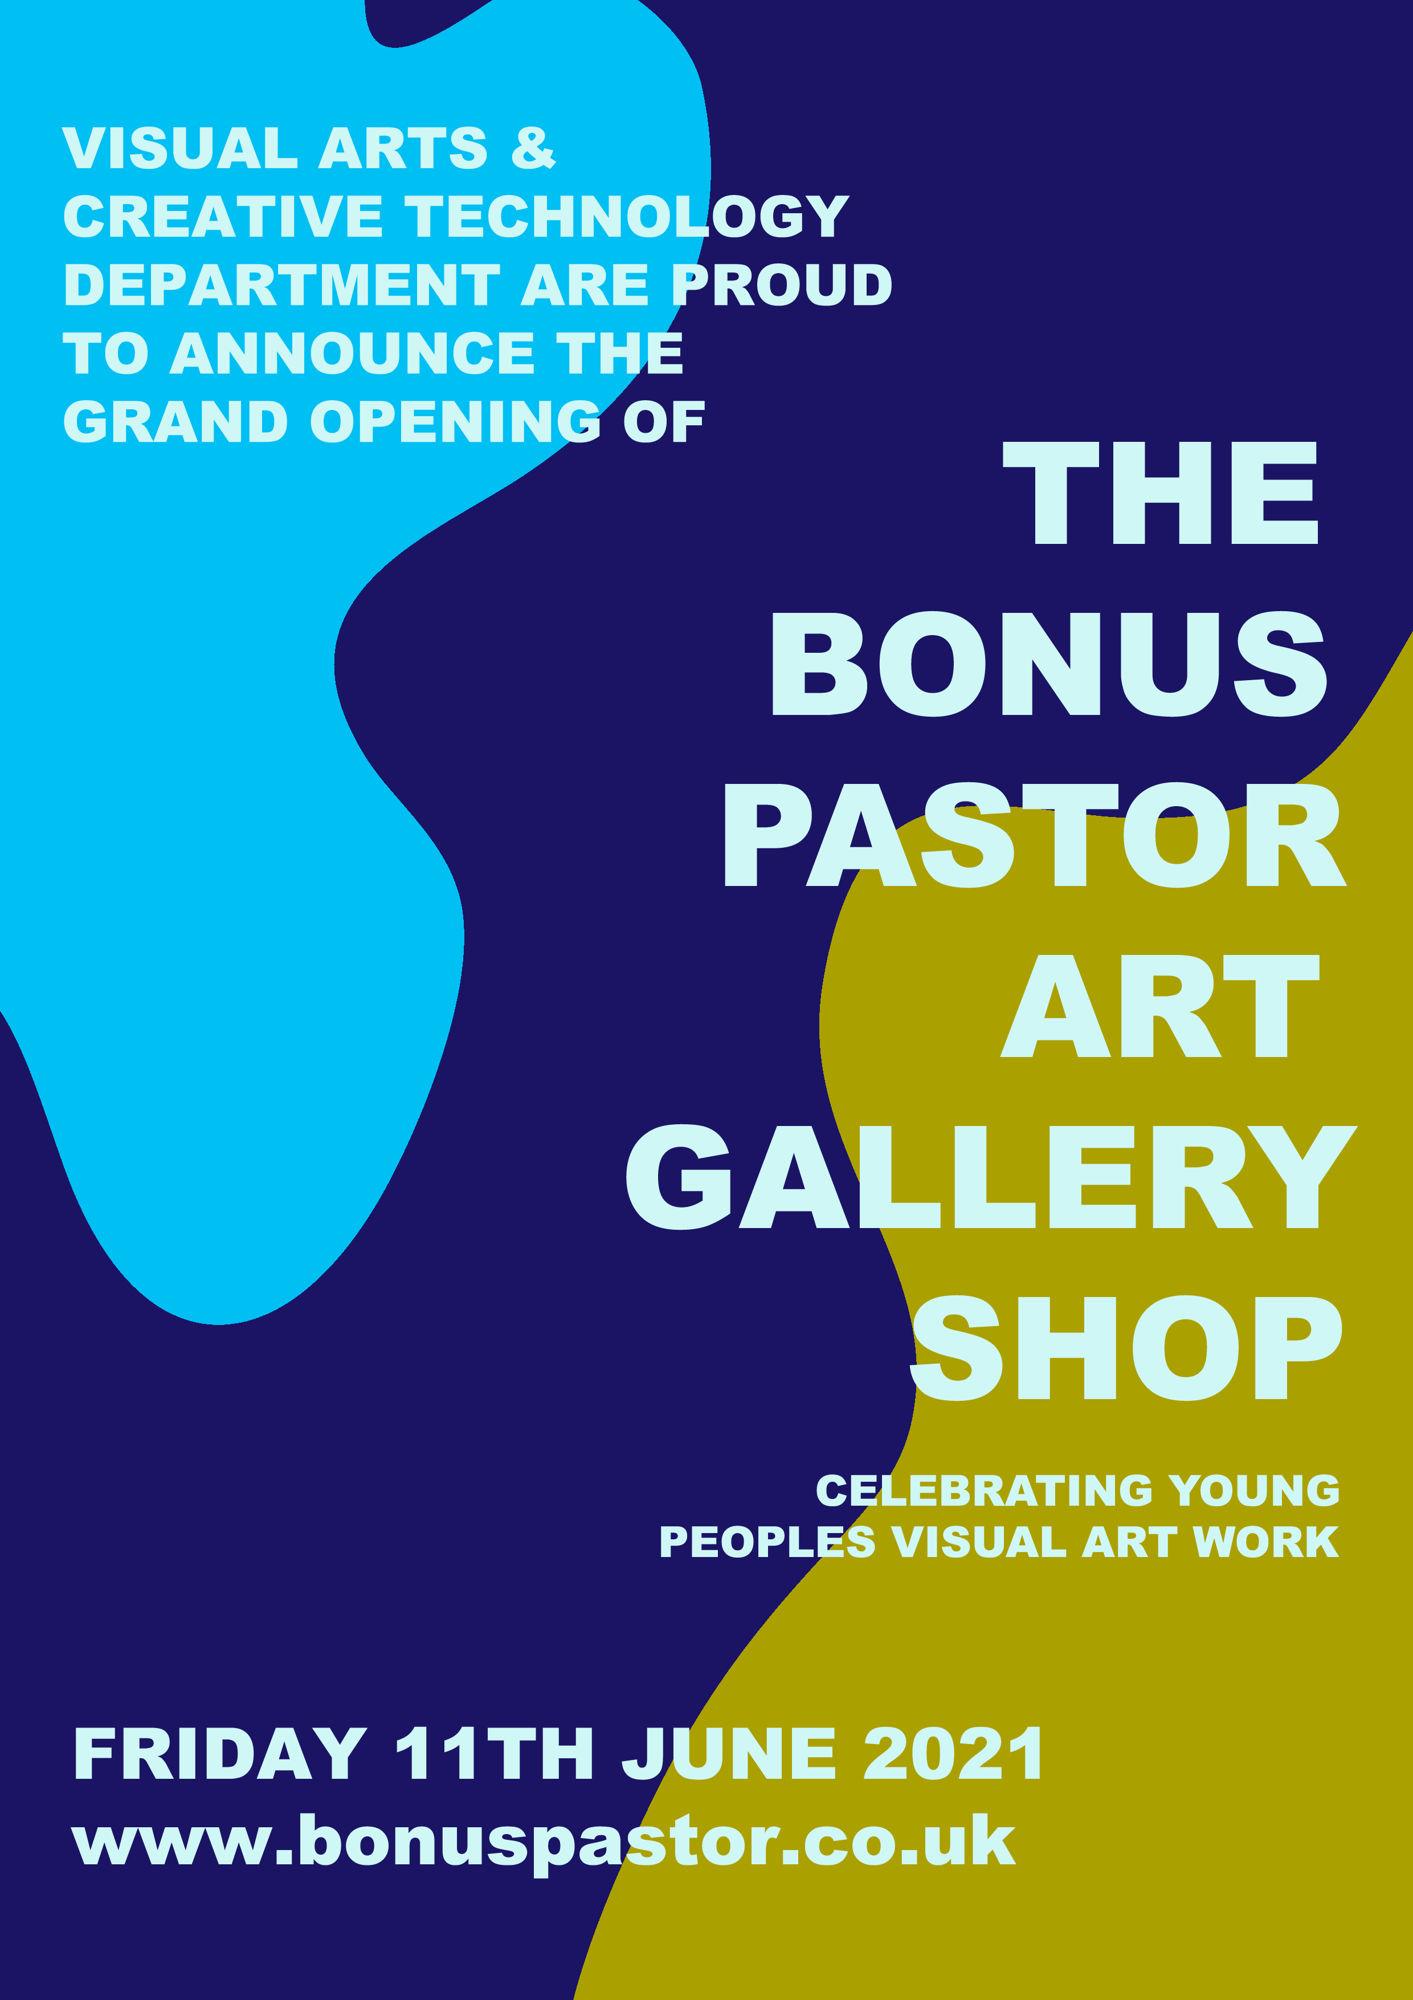 THE BONUS PASTOR ART GALLERY SHOP